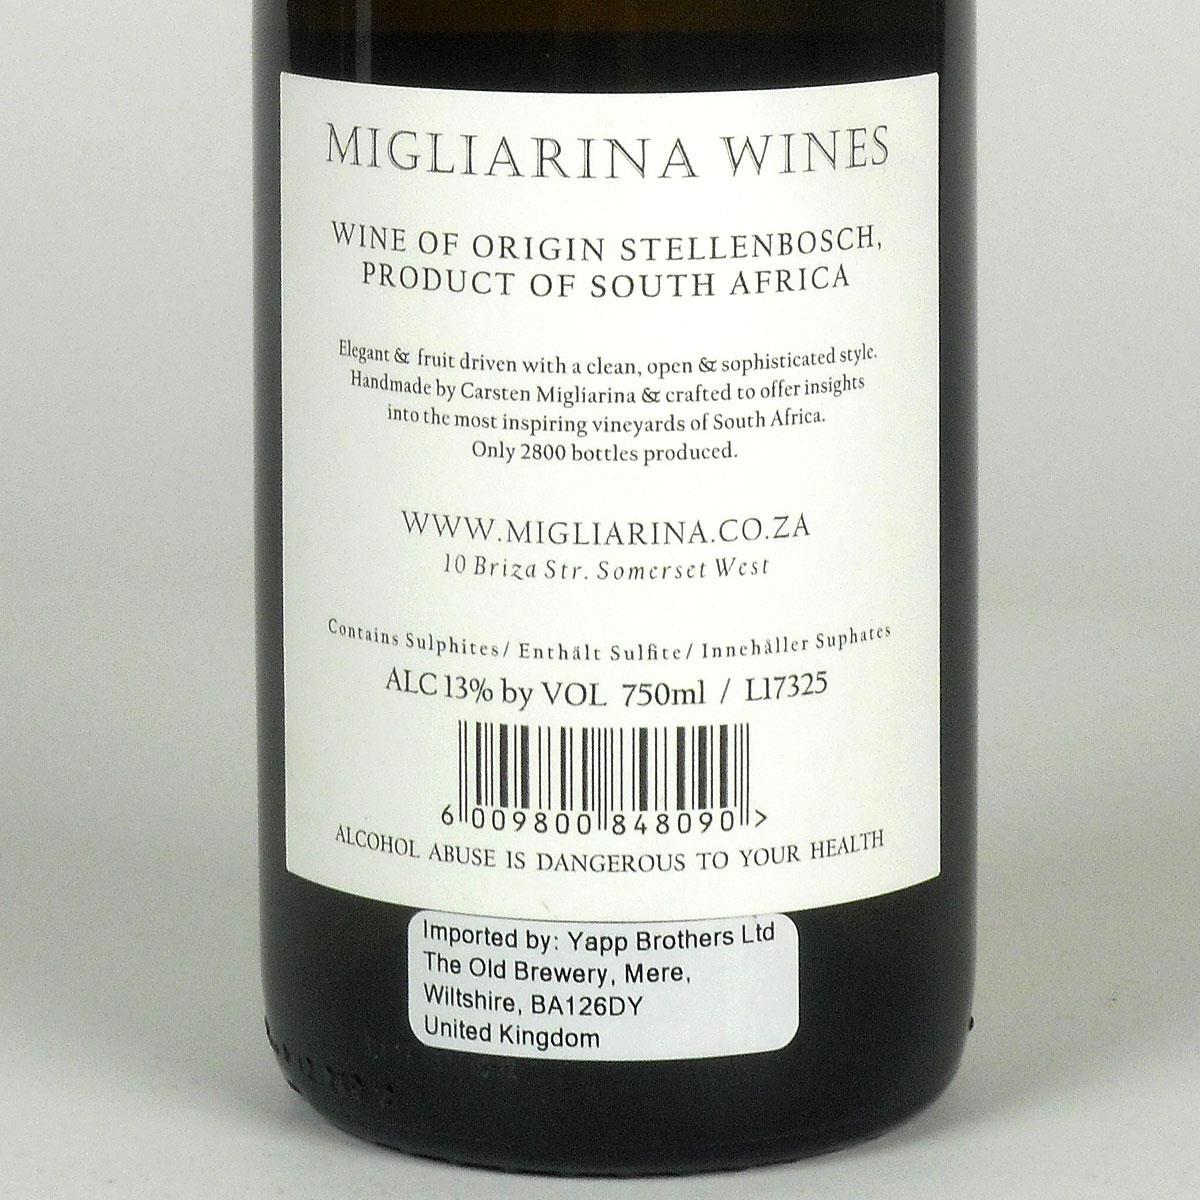 Stellenbosch: Migliarina Chenin Blanc 2017 - Bottle Rear Label